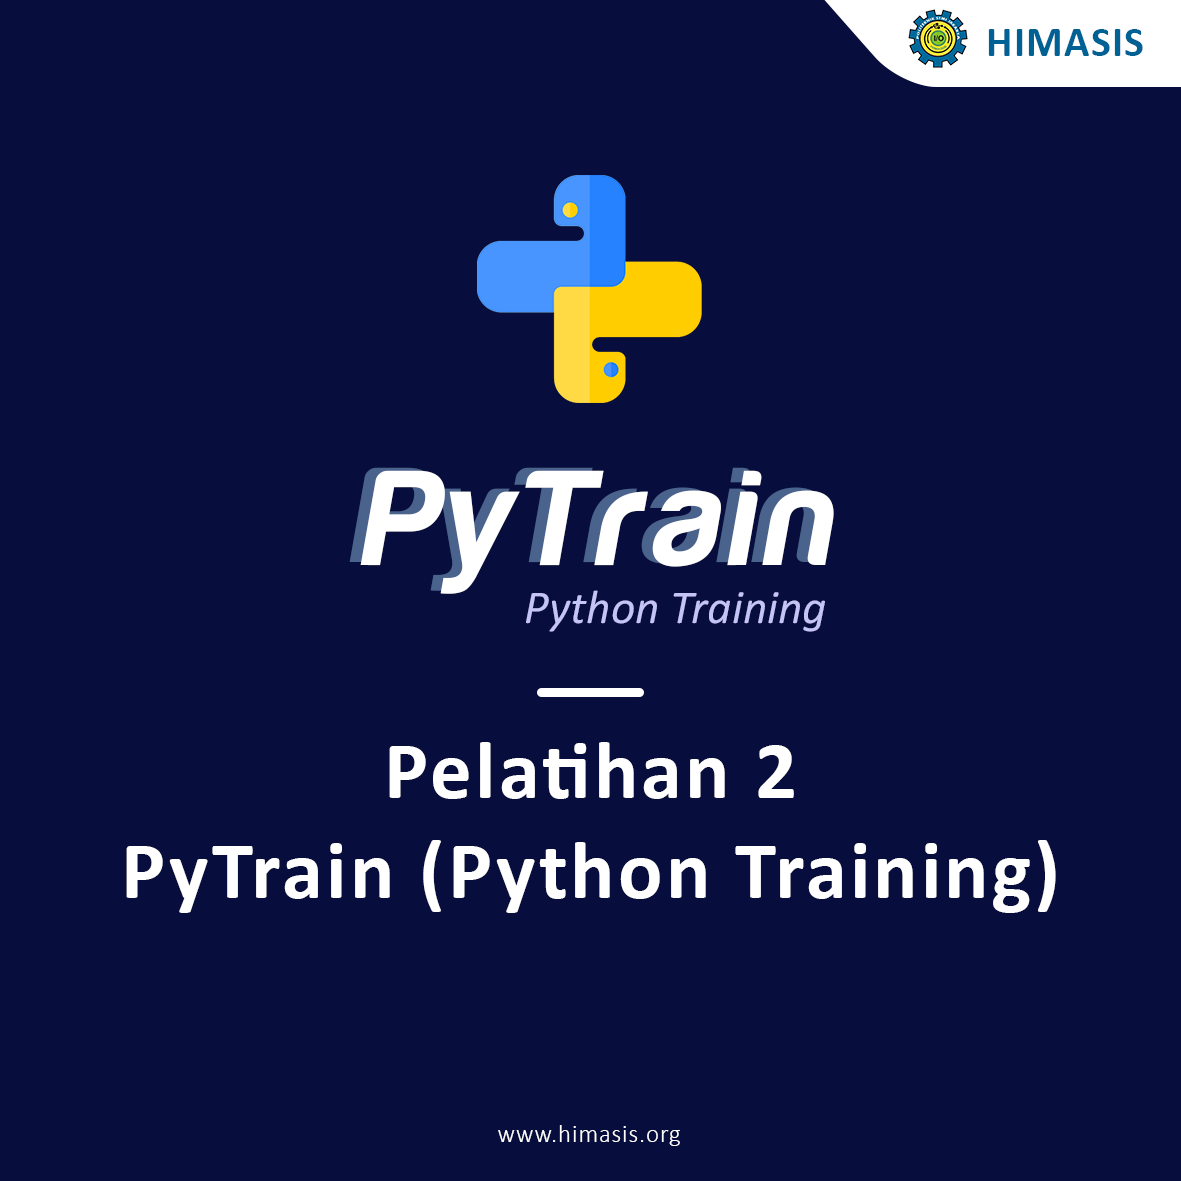 Pelatihan 2 : Py Train